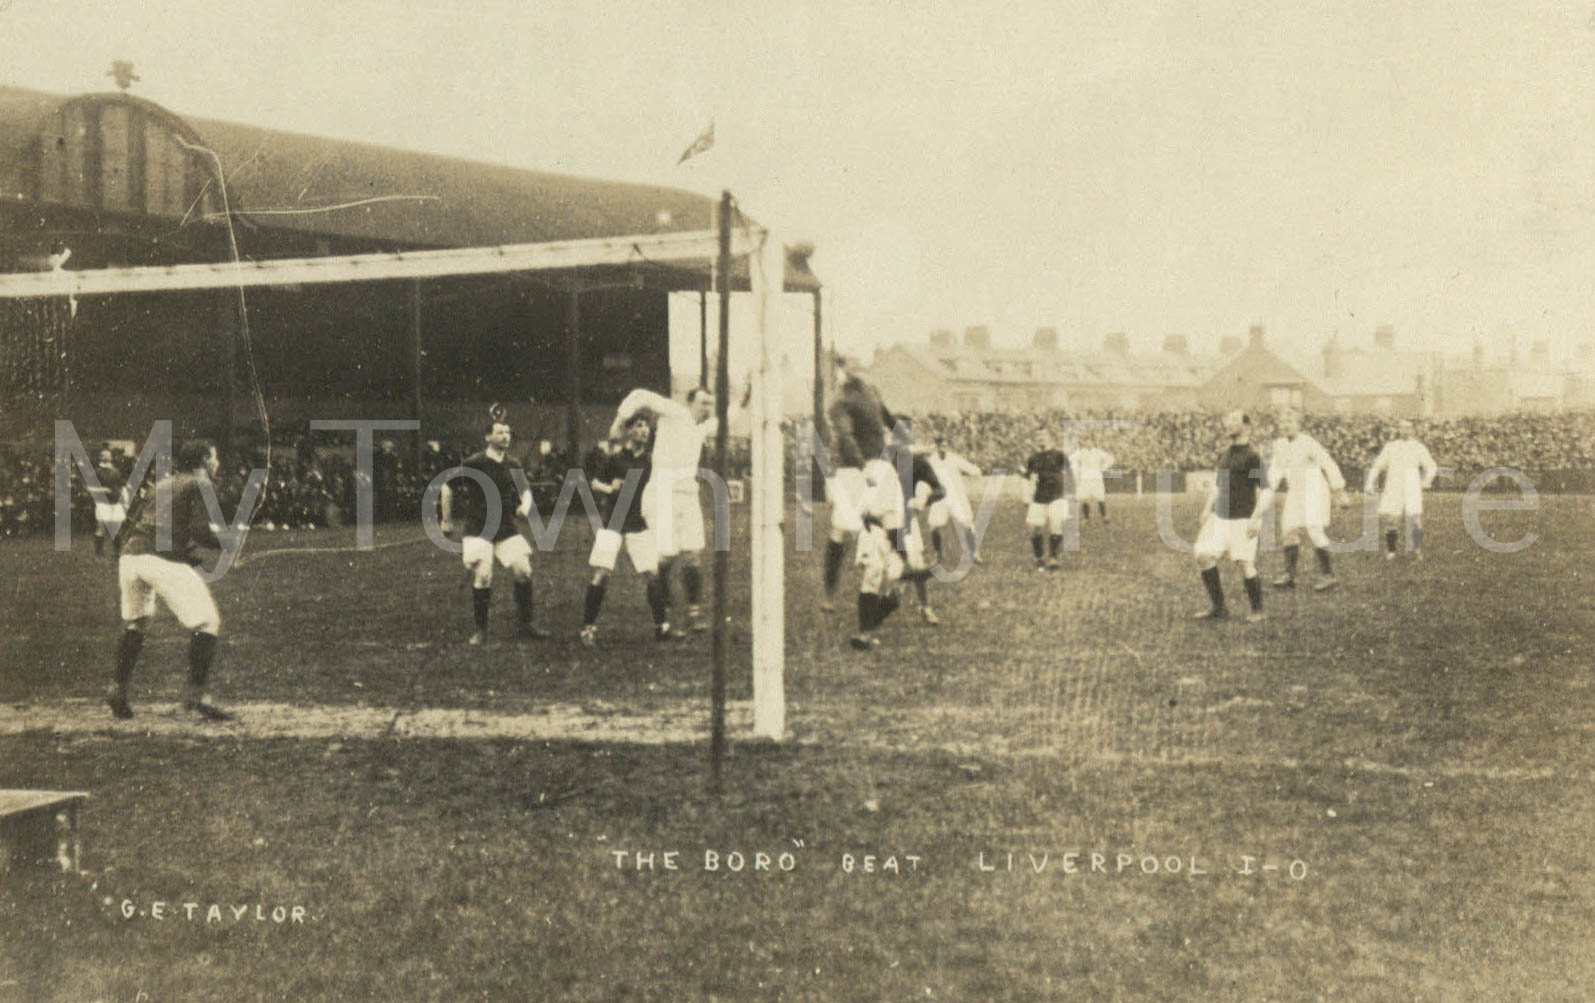 Middlesbrough Football Club v Liverpool